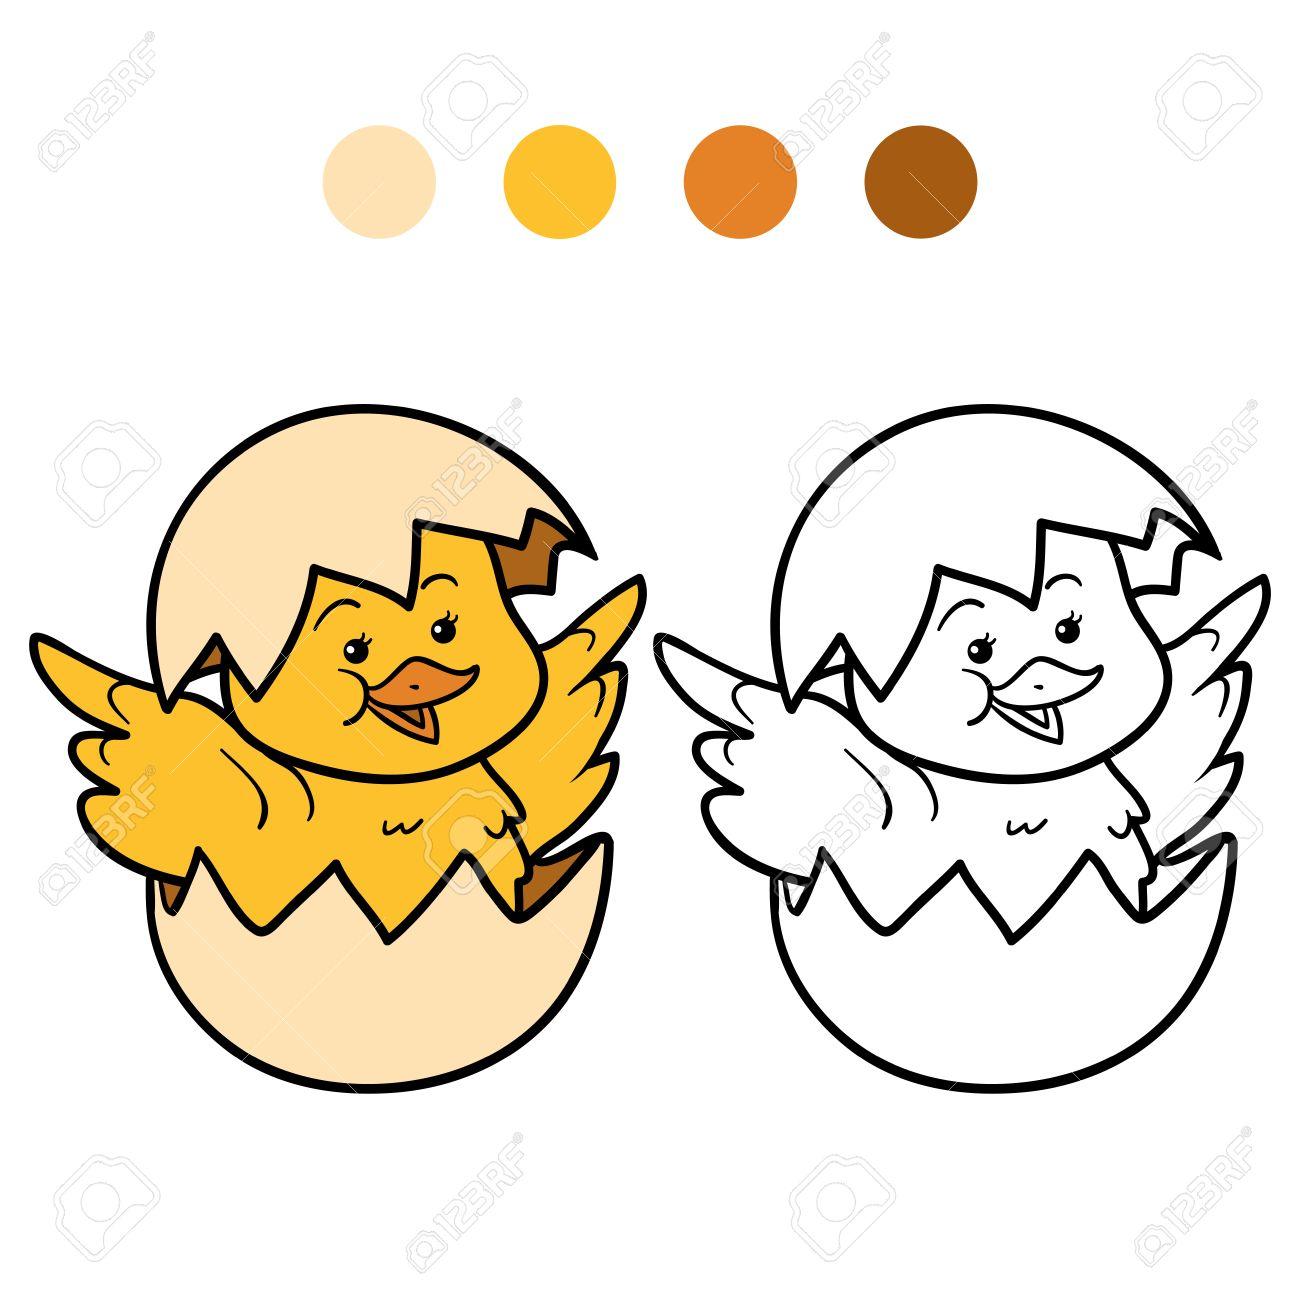 Asombroso Pollo Correr Para Colorear Imágenes - Dibujos Para ...